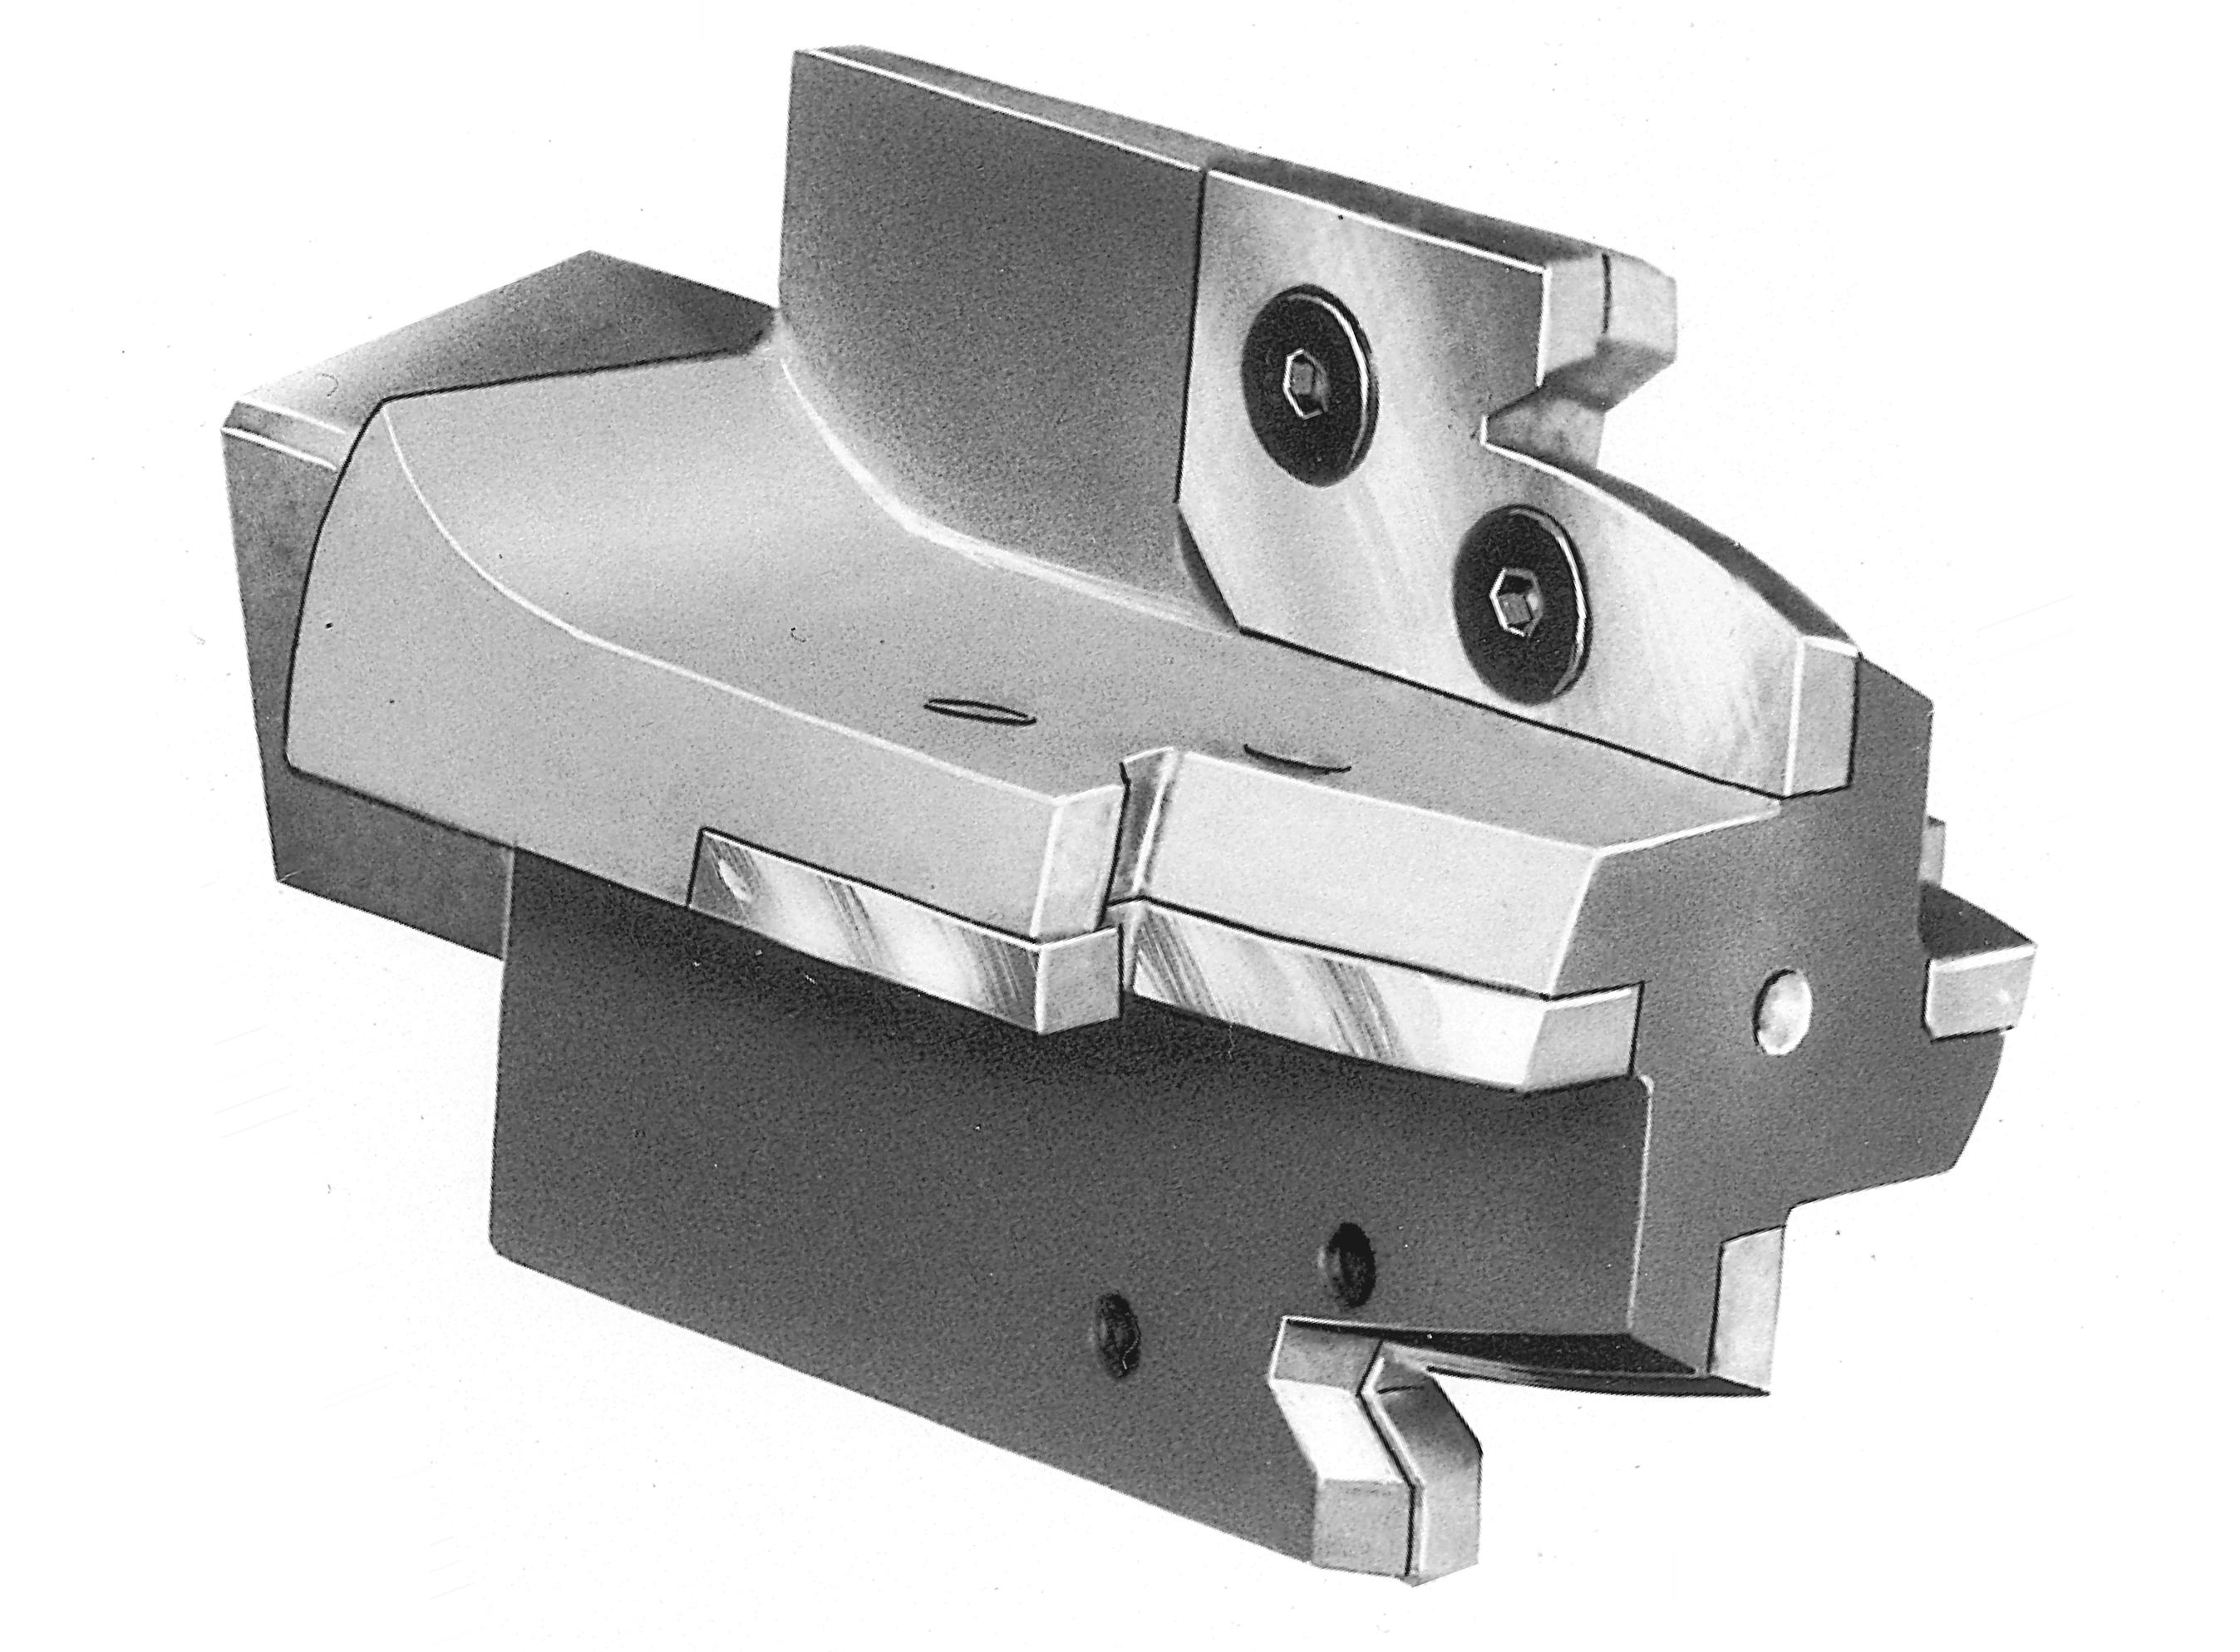 Landis Weight Machine, Threading, Stapler - Machine Tool (2695x1988), Png Download